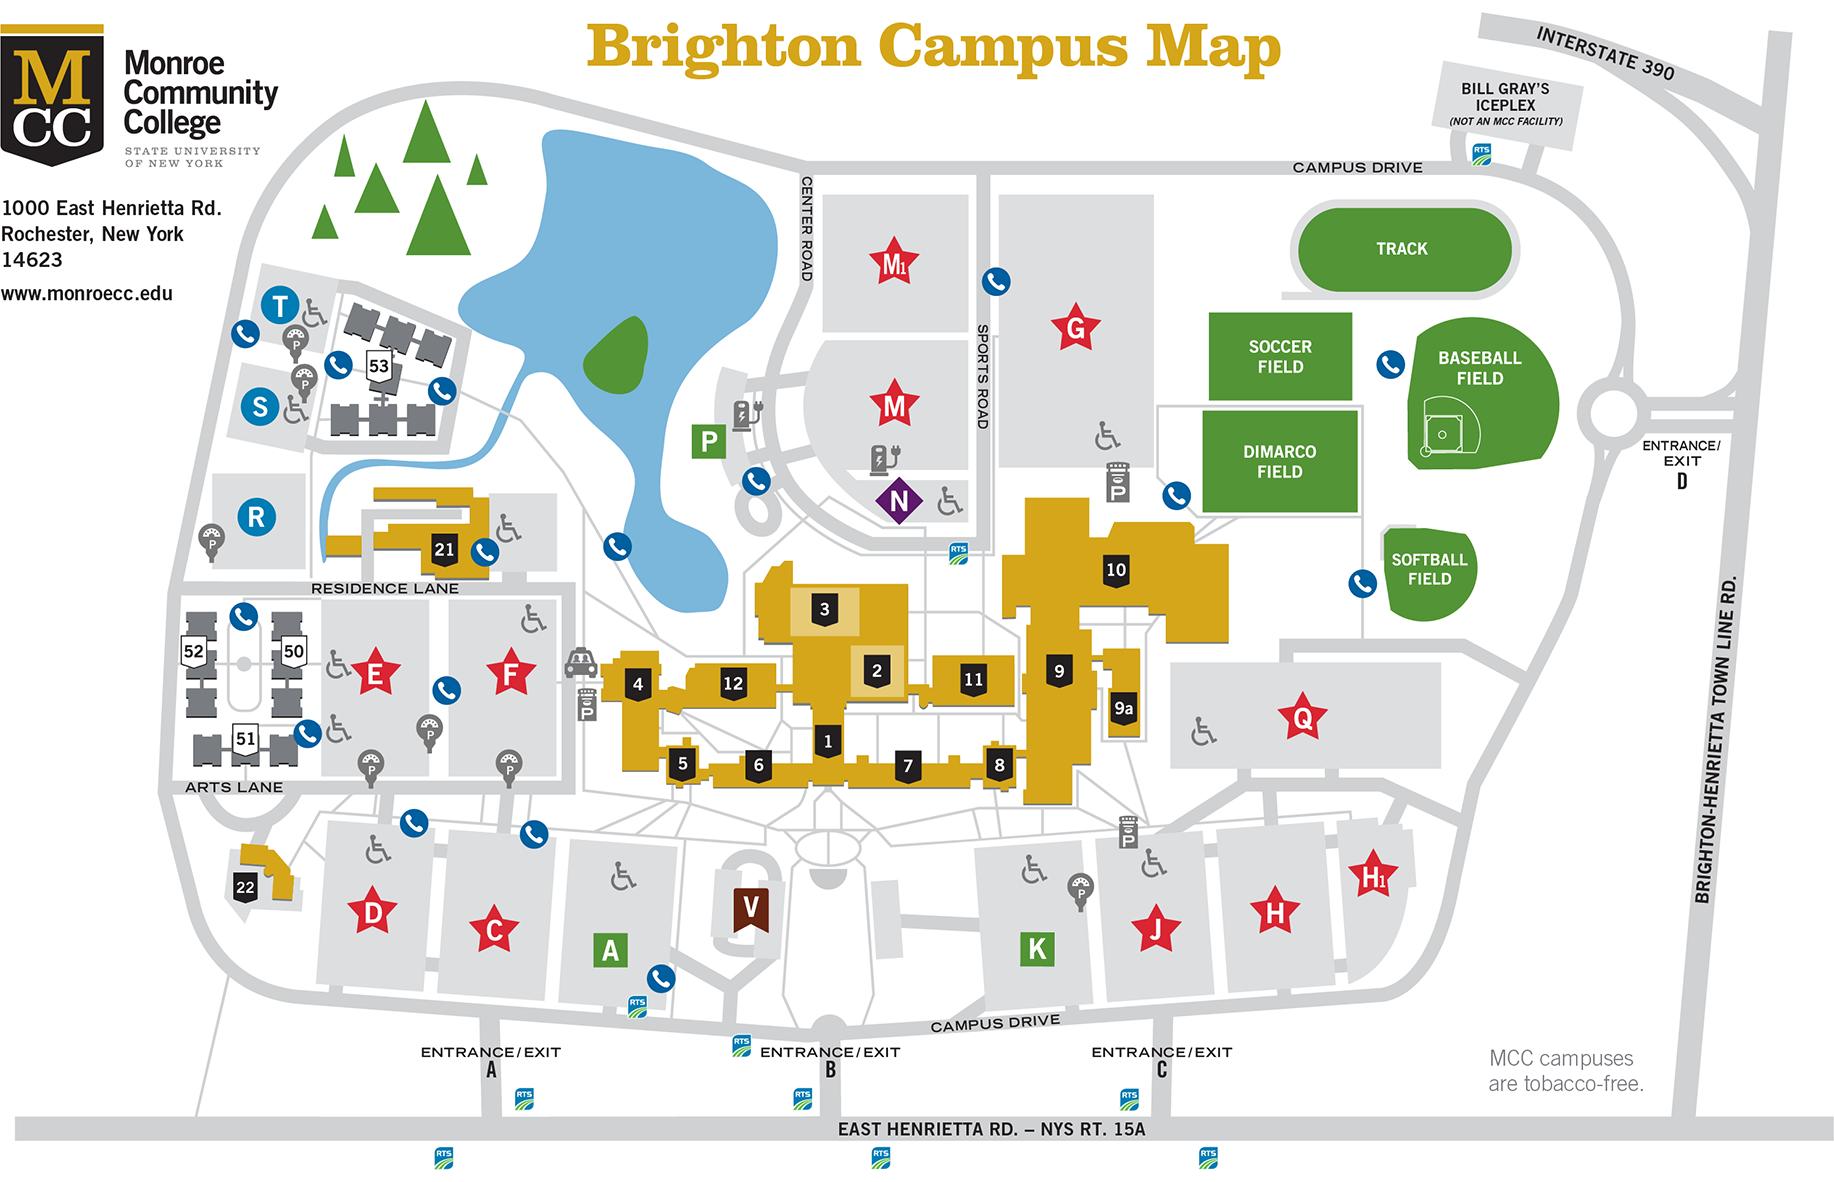 Brighton Campus About Mcc Monroe Community College